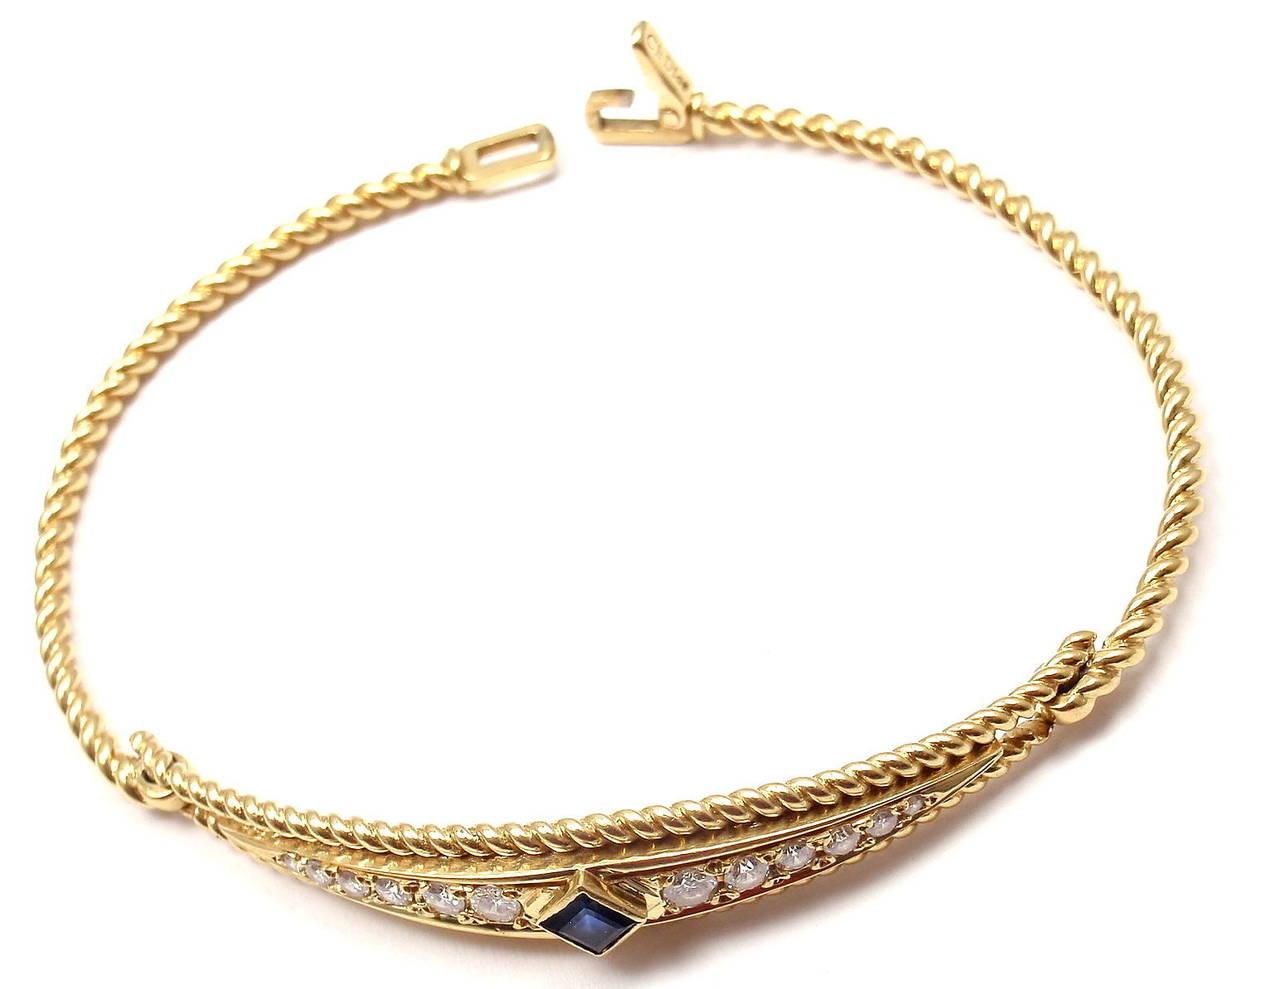 Christian Dior Sapphire Diamond Yellow Gold Bangle Bracelet For Sale 2